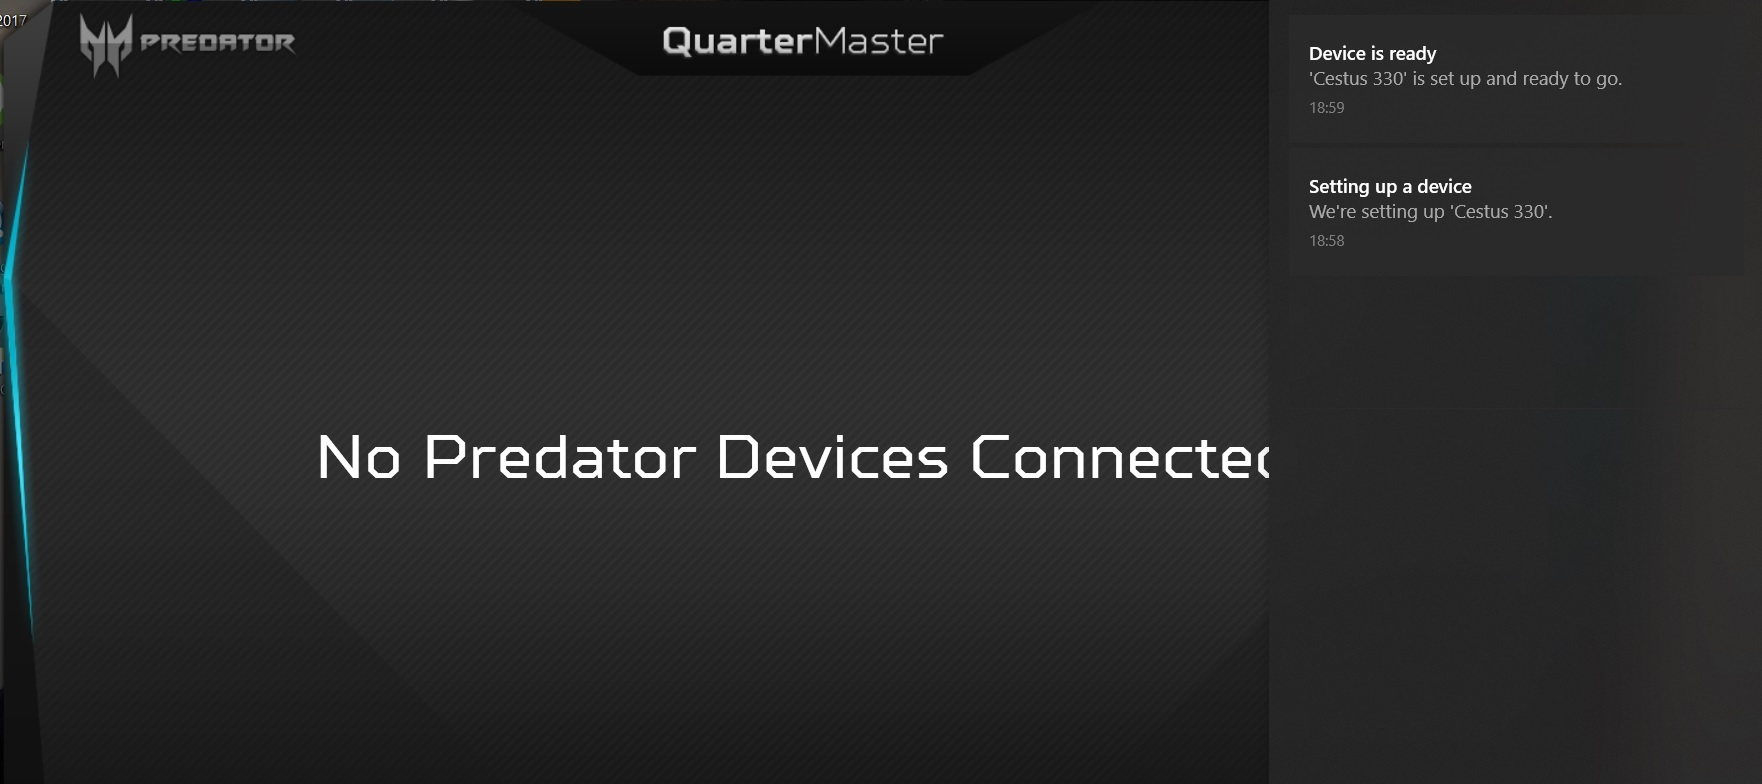 No Predator Devices Connected